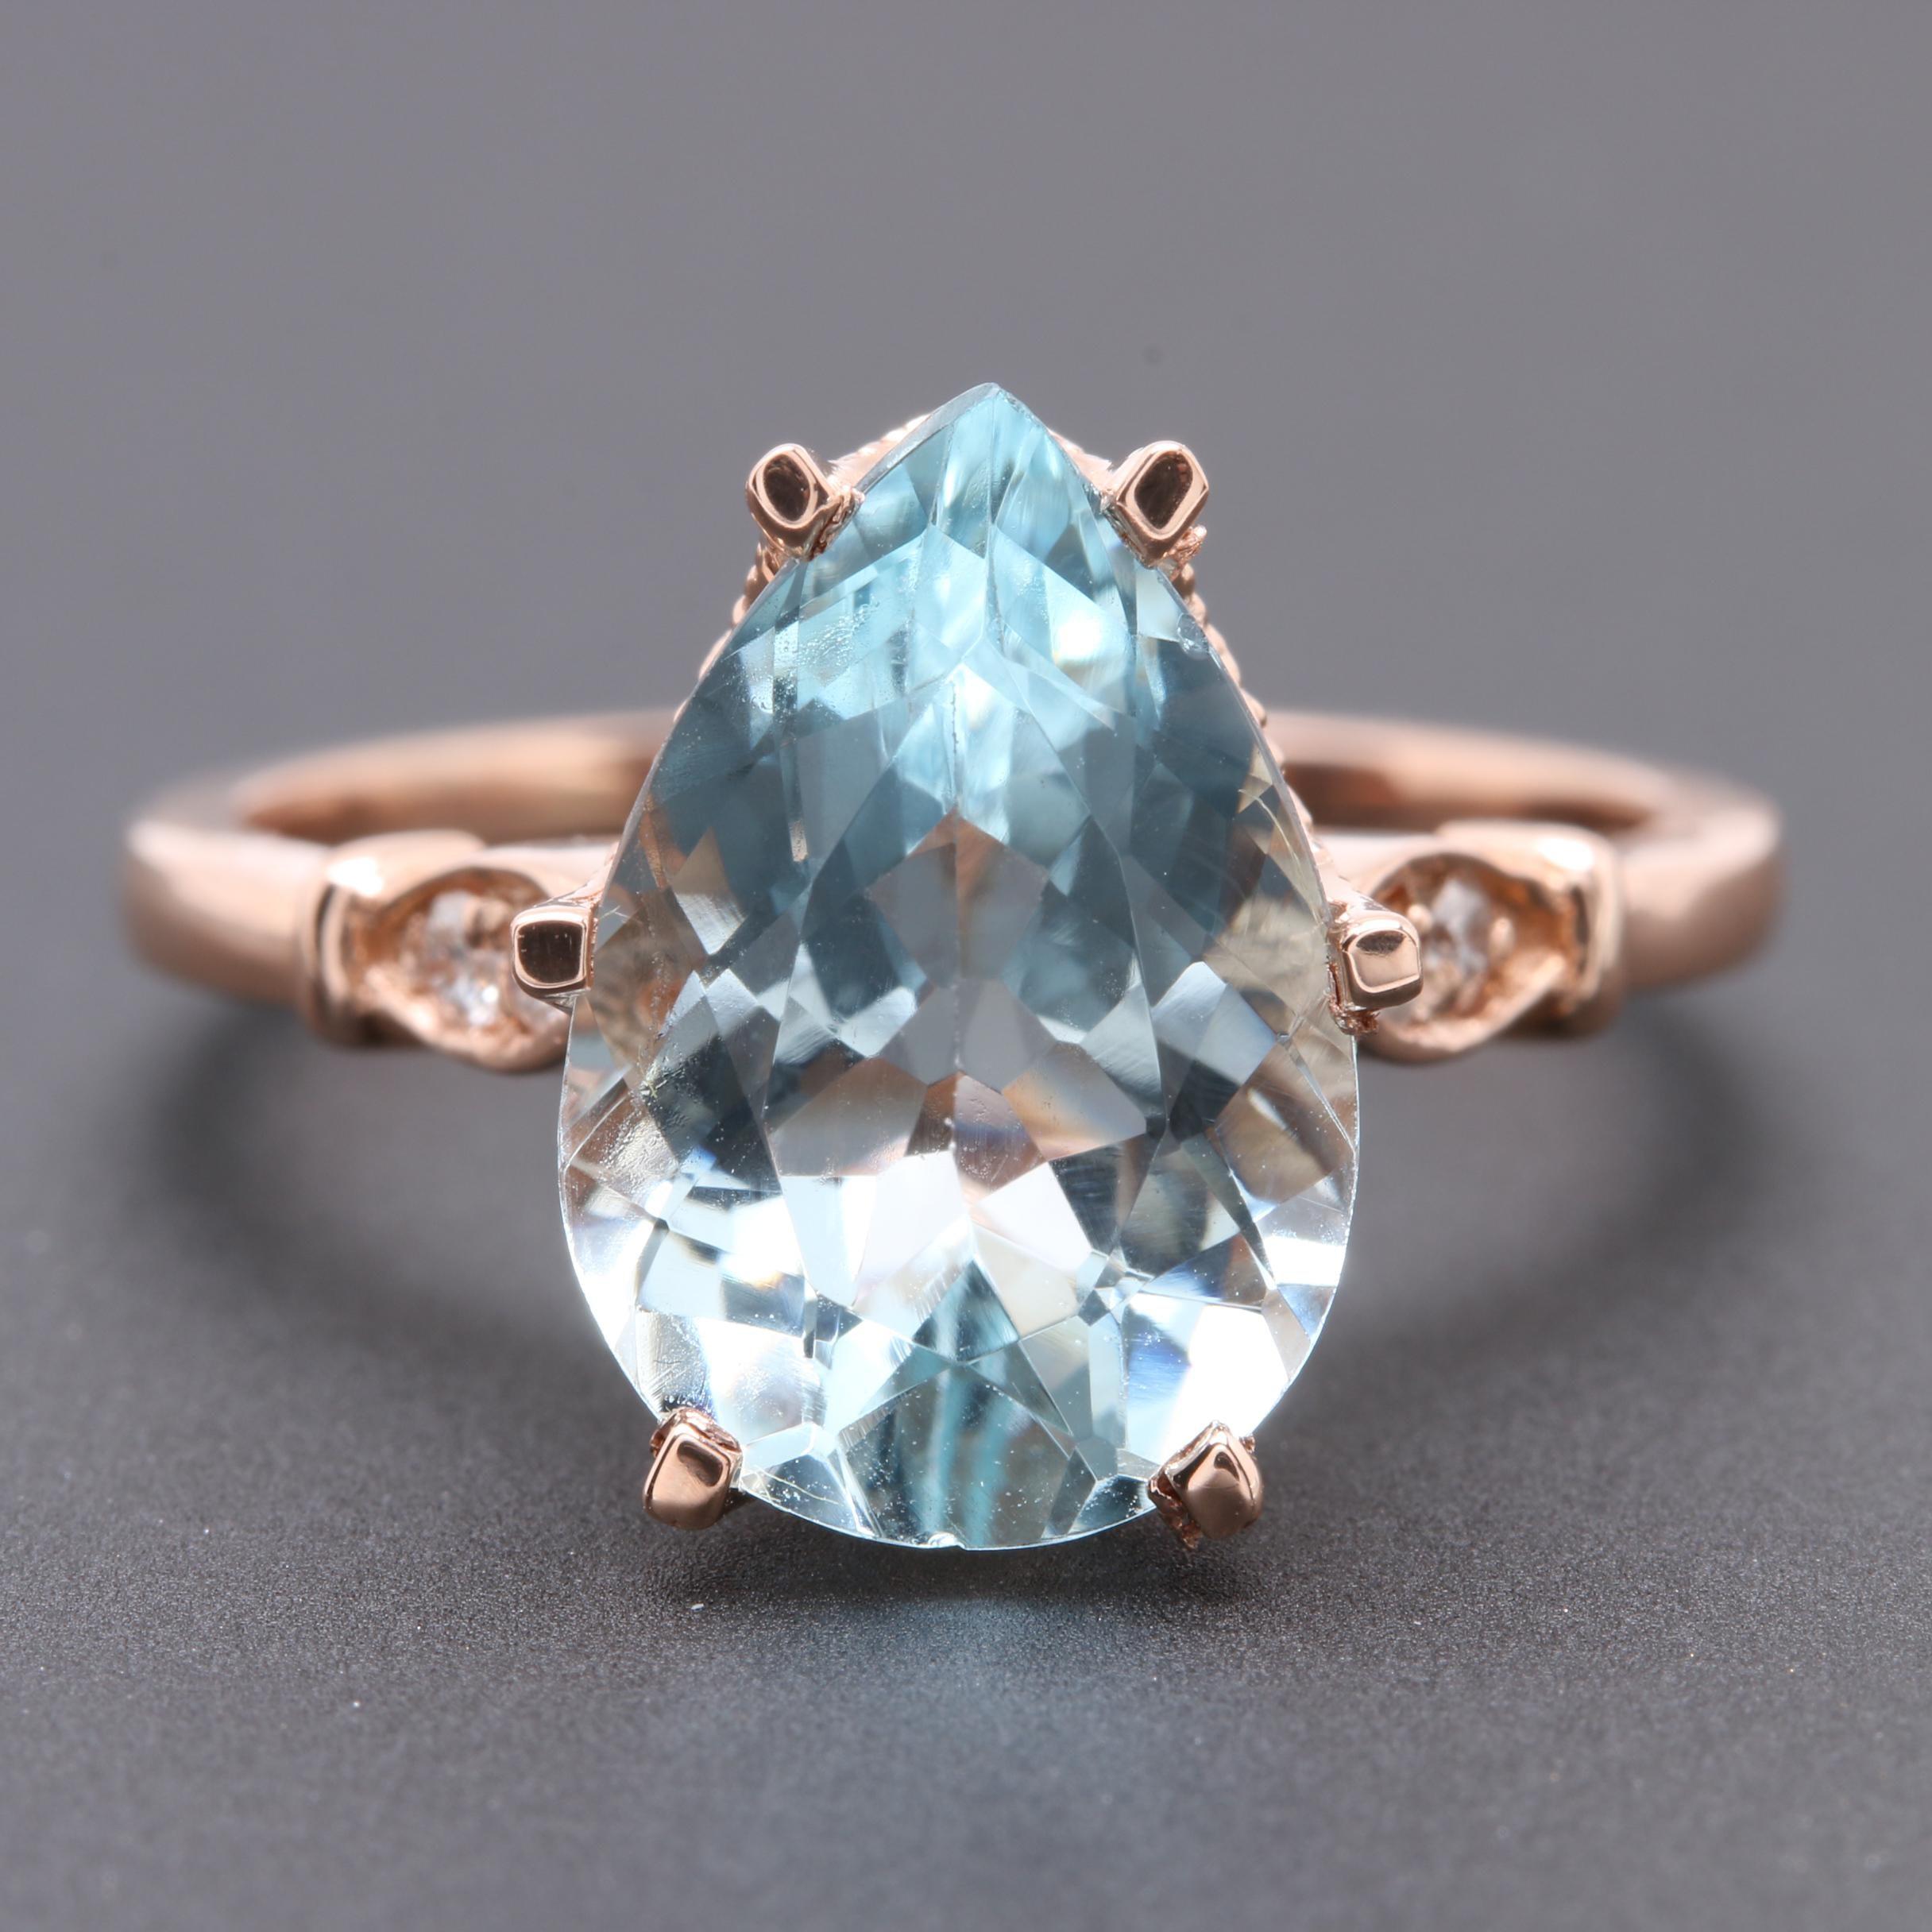 14K Rose Gold 3.31 CT Aquamarine and Diamond Ring